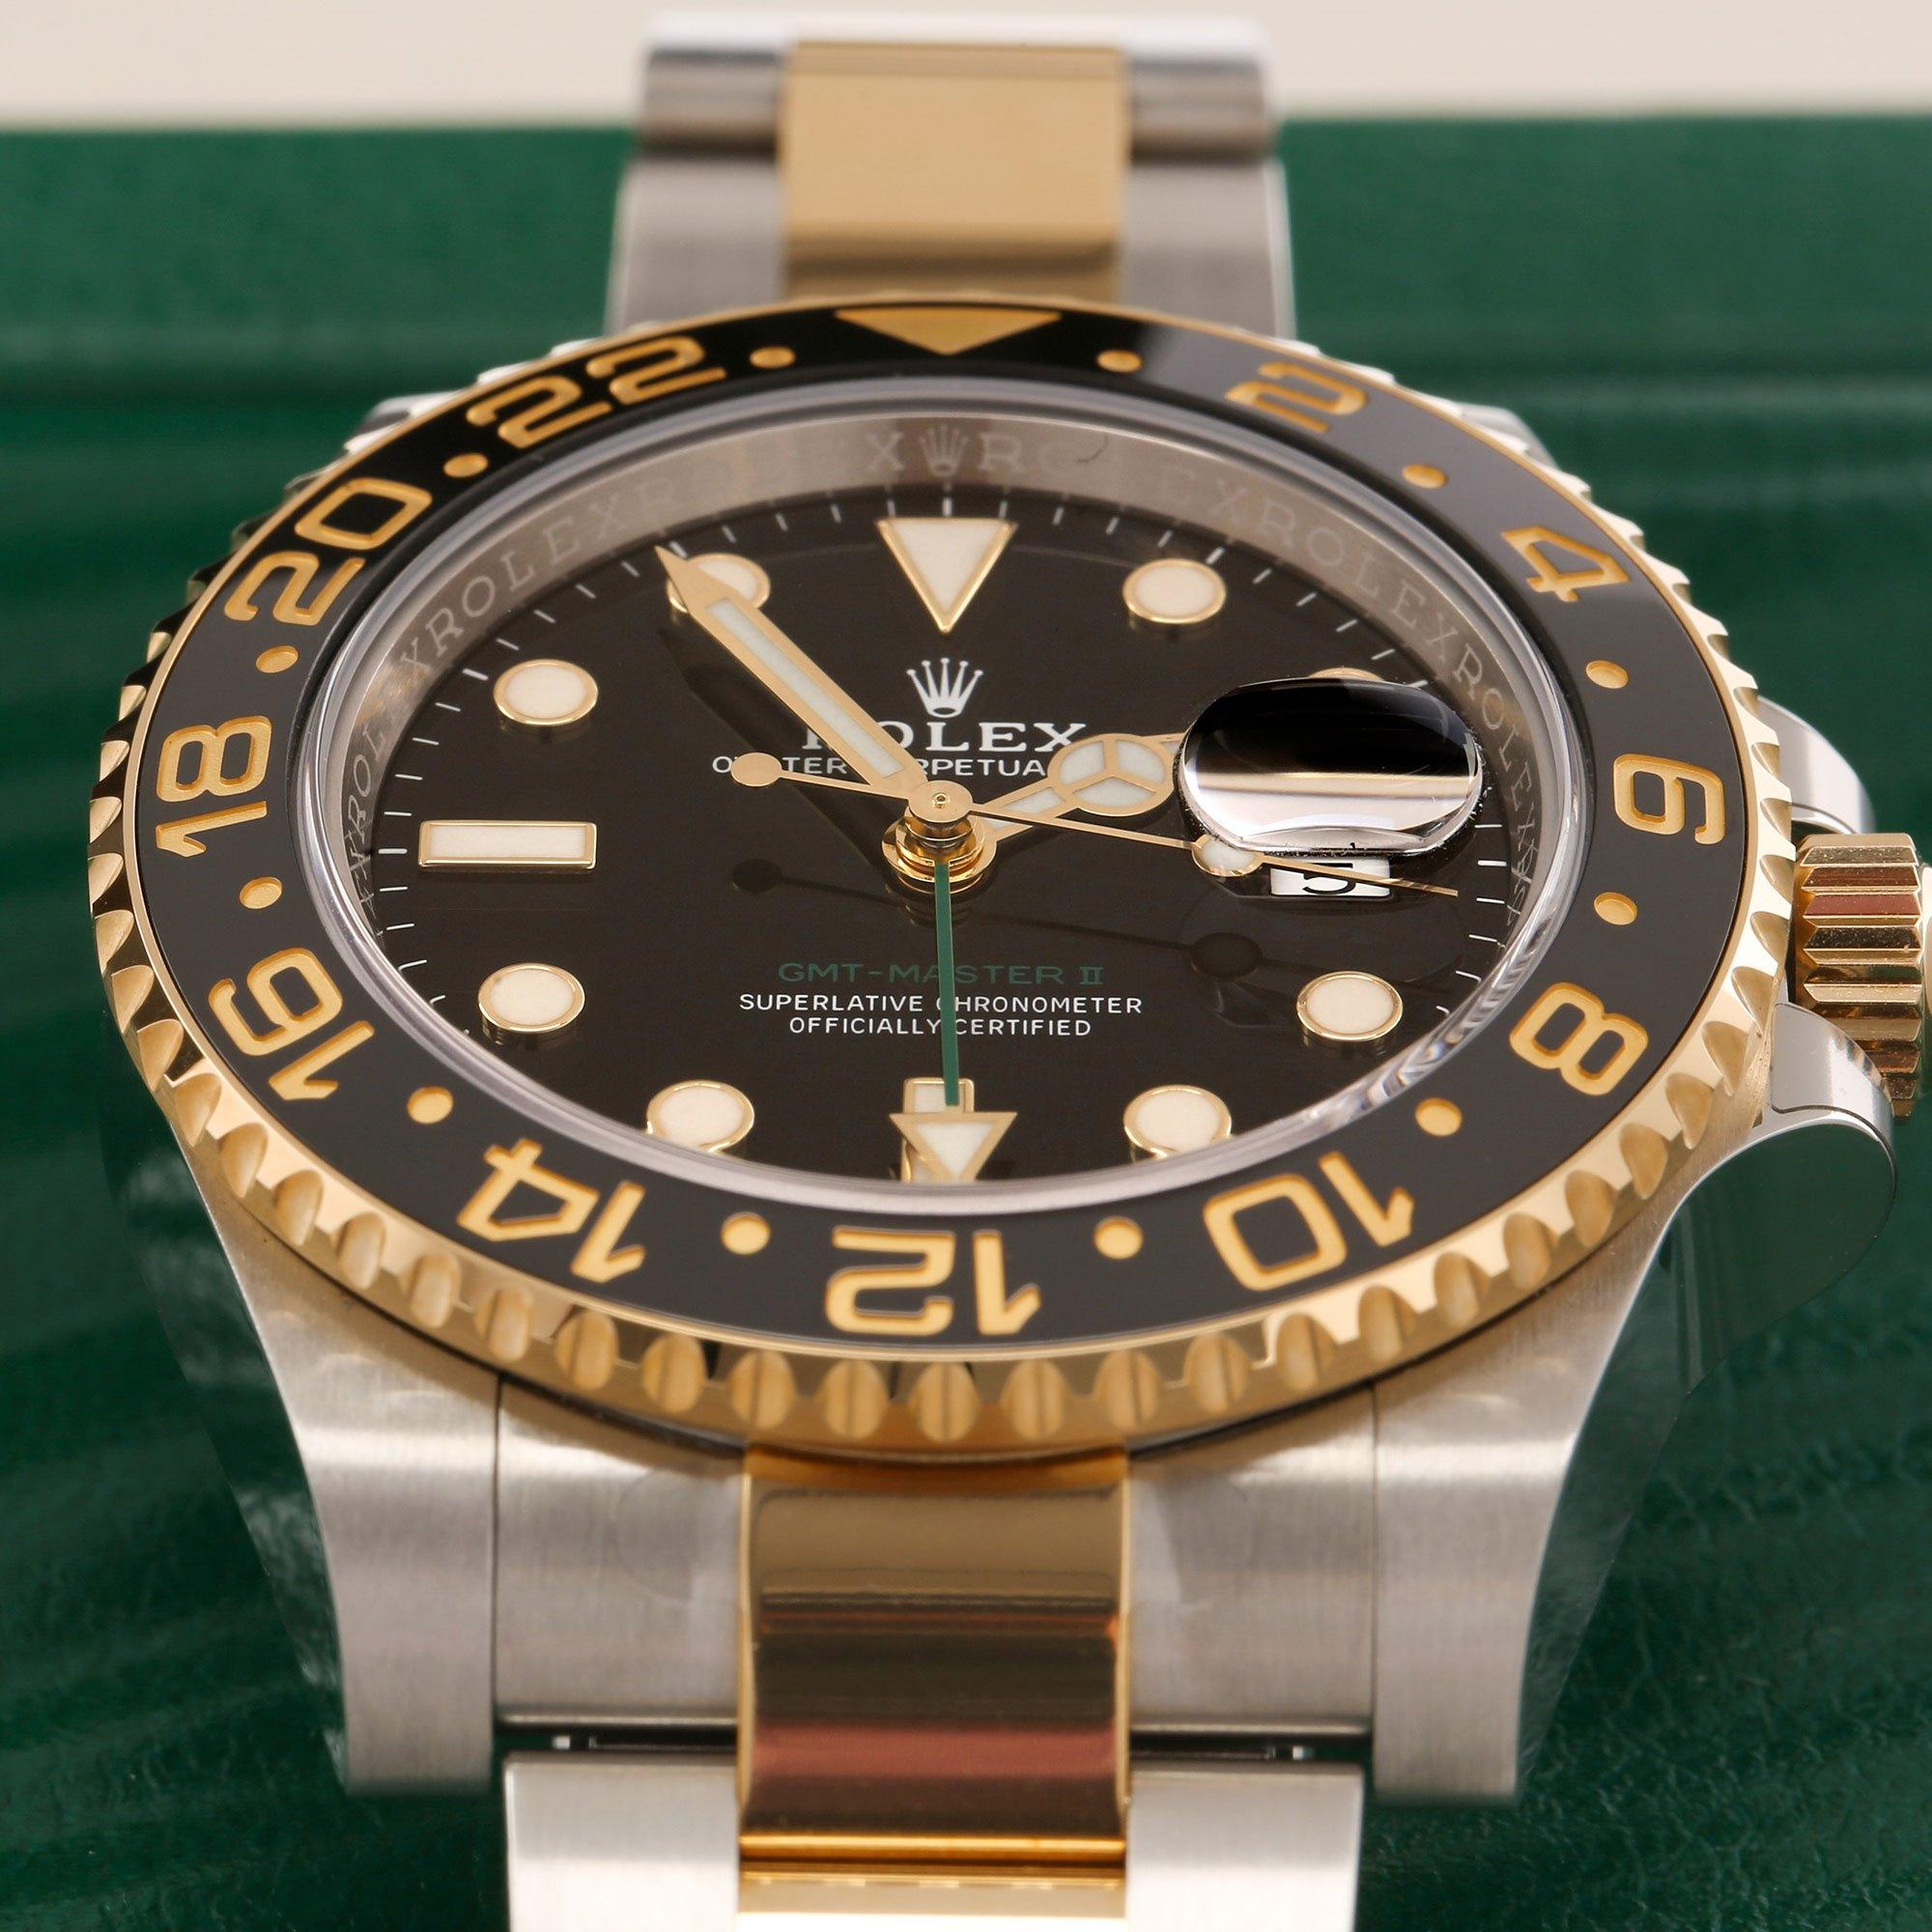 Rolex GMT-Master II Stainless Steel 116713LN